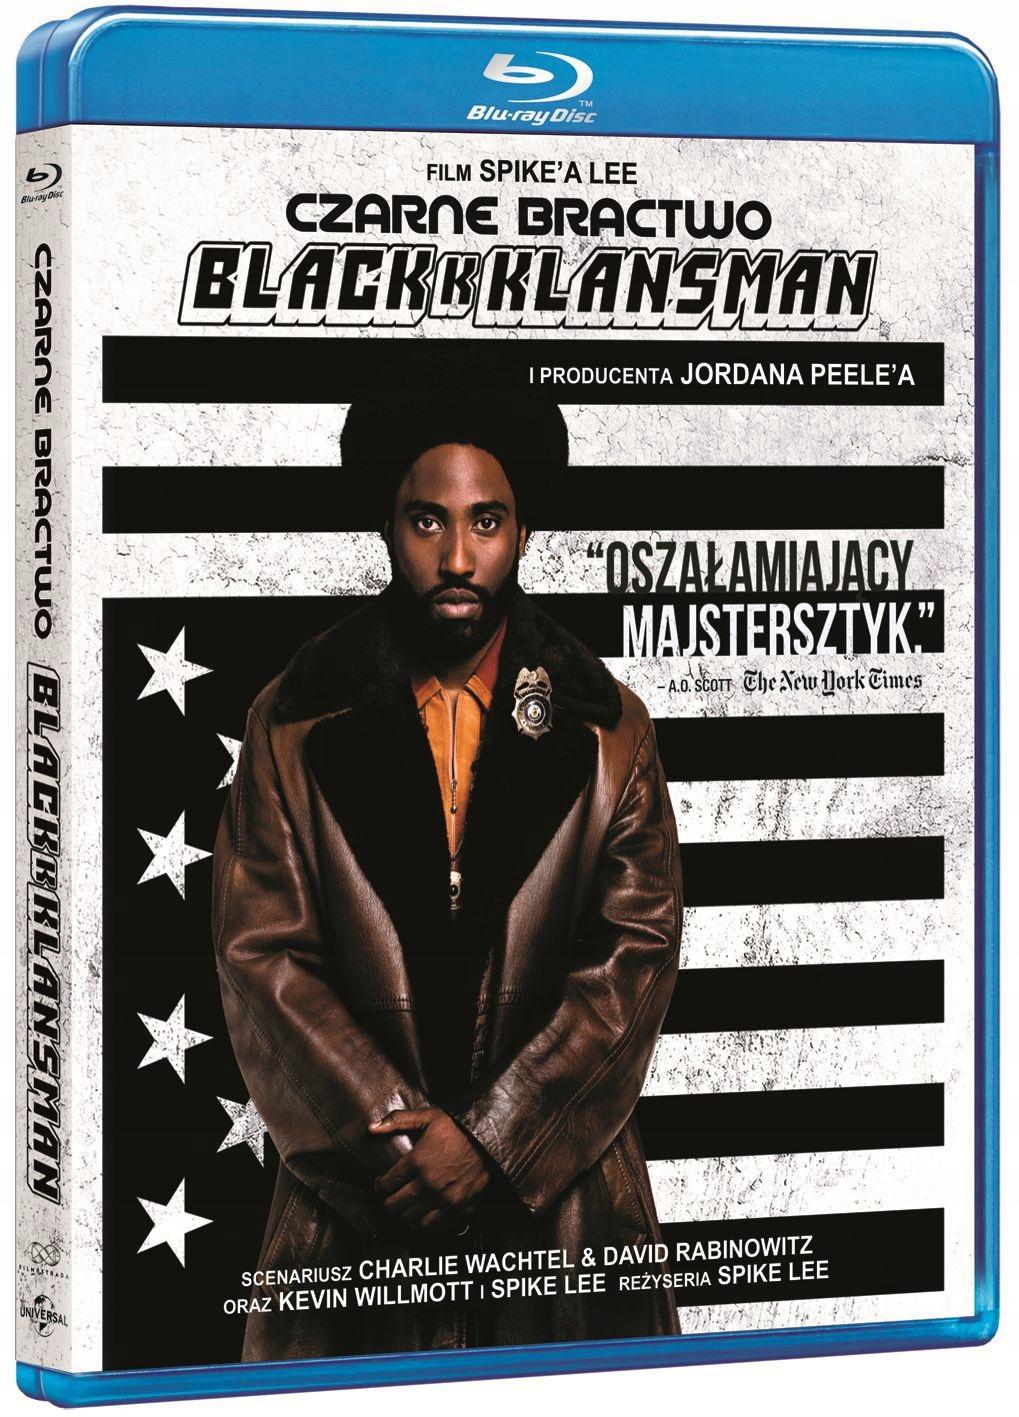 CZARNE BRACTWO. BLACKKKLANSMAN [BLU-RAY]